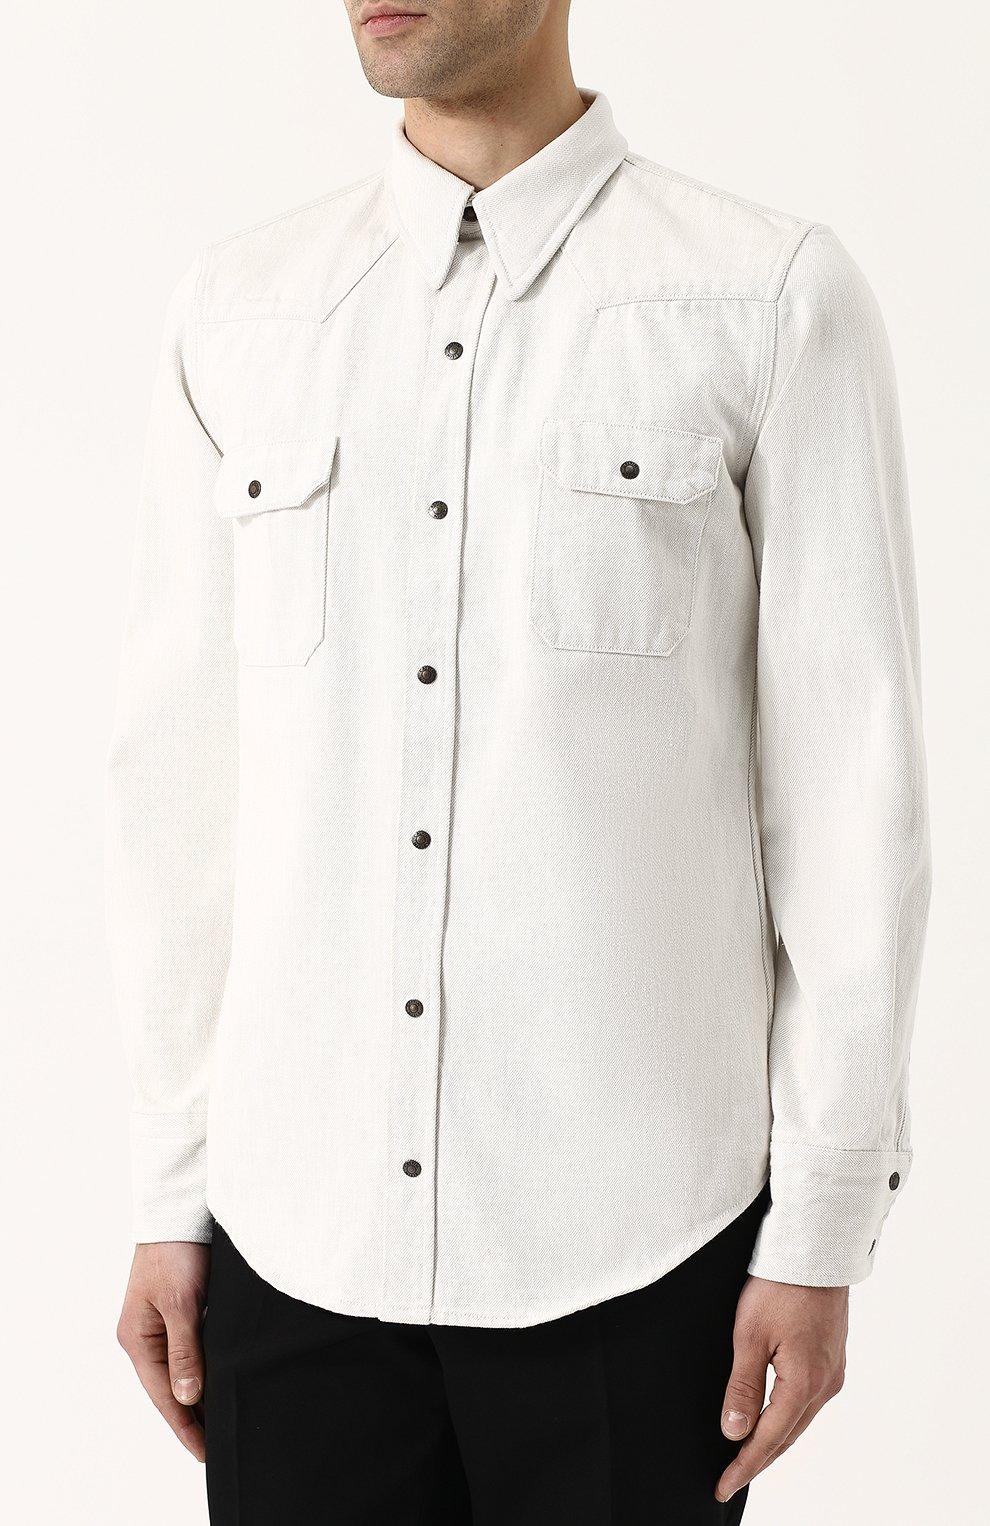 Джинсовая рубашка на кнопках CALVIN KLEIN 205W39NYC белая | Фото №3